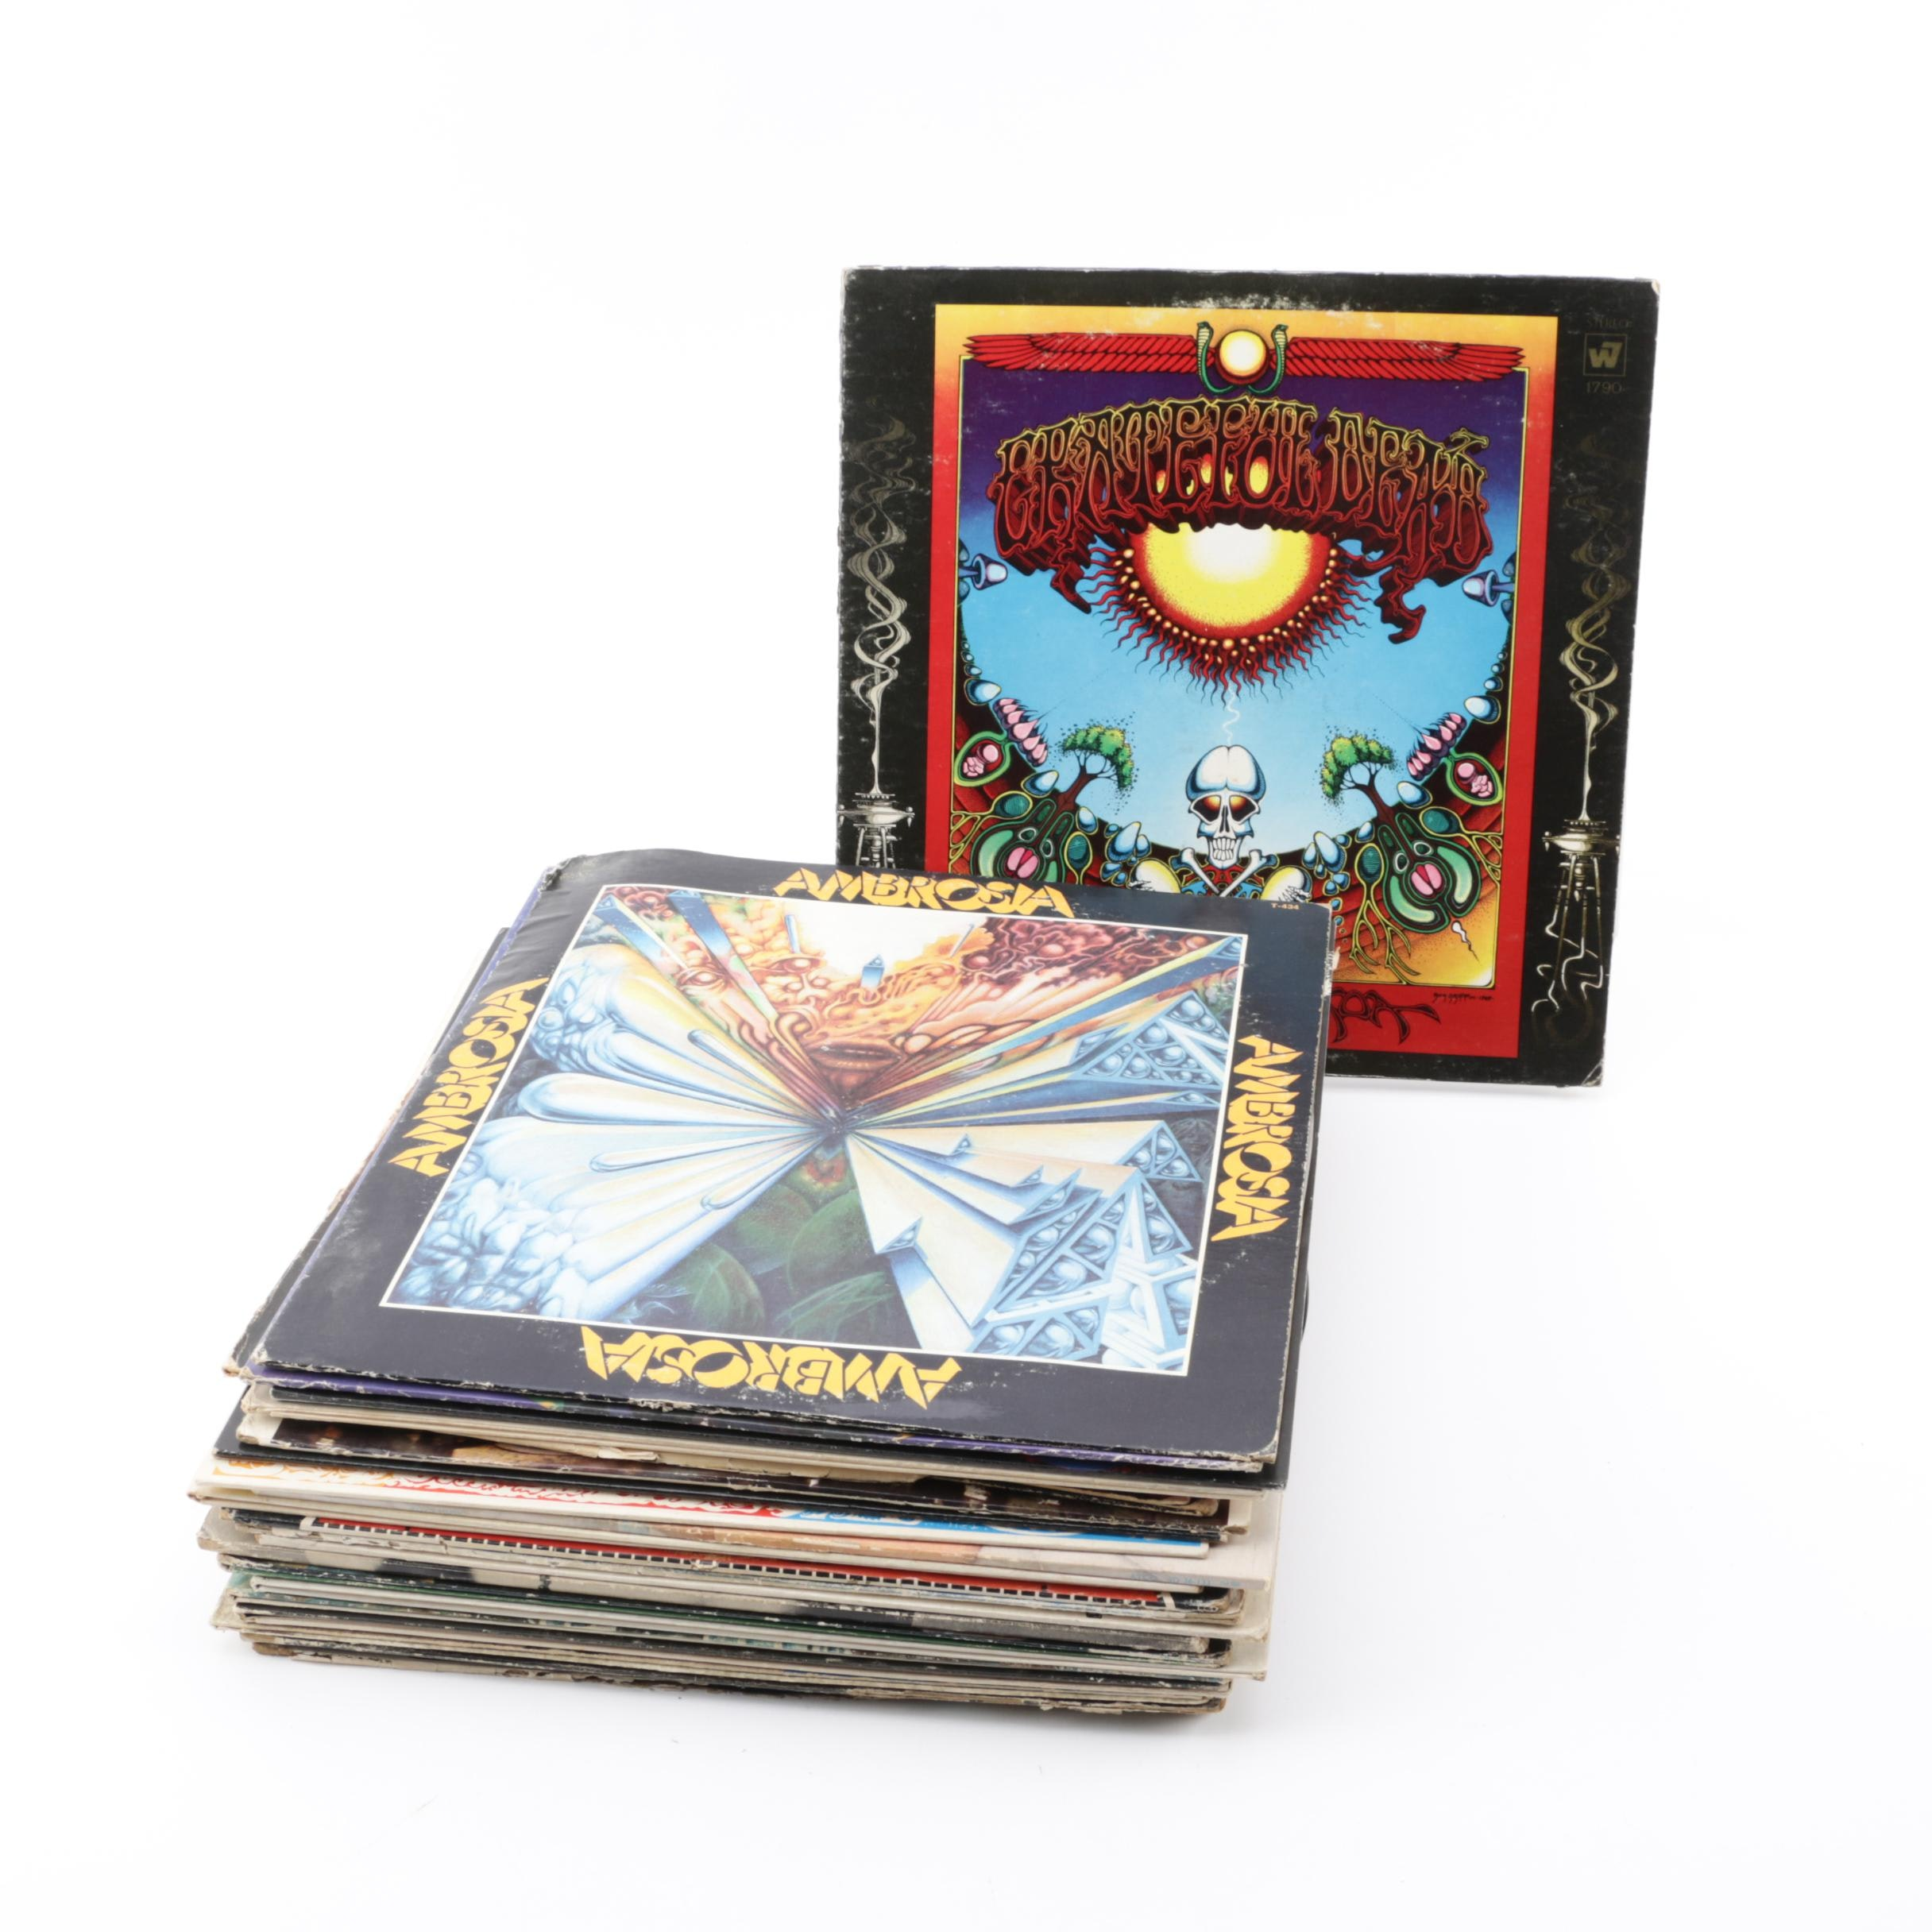 Vintage Psychedelic Rock and Folk Vinyl Records Including Grateful Dead